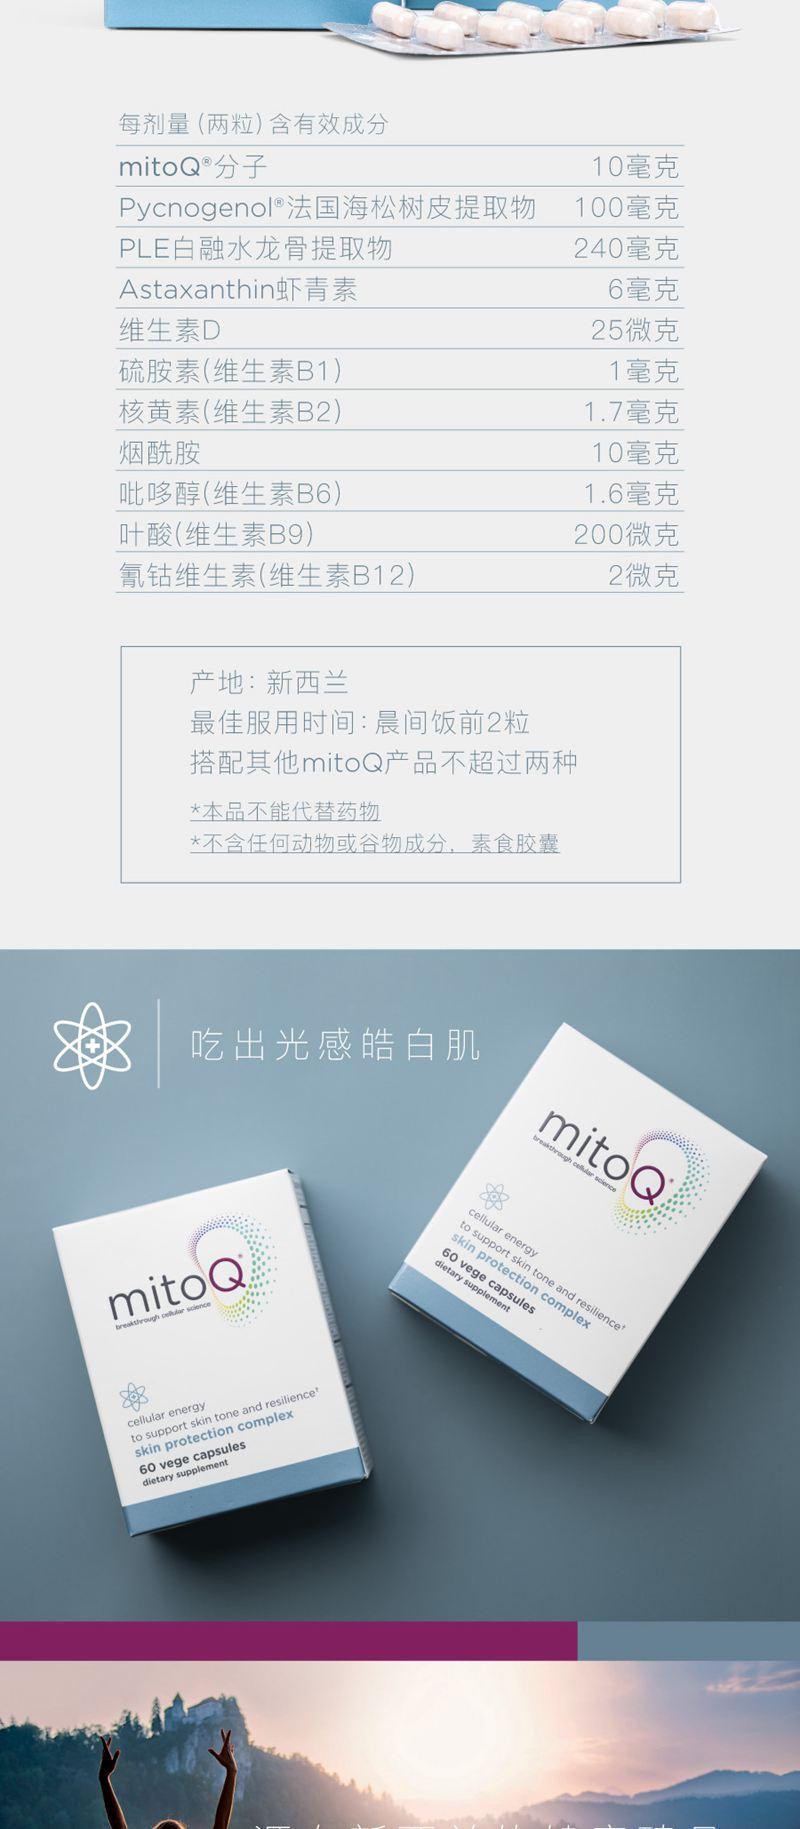 MitoQ皓白口服美容祛黄美白淡斑全身提亮肤色胶囊60粒 信息